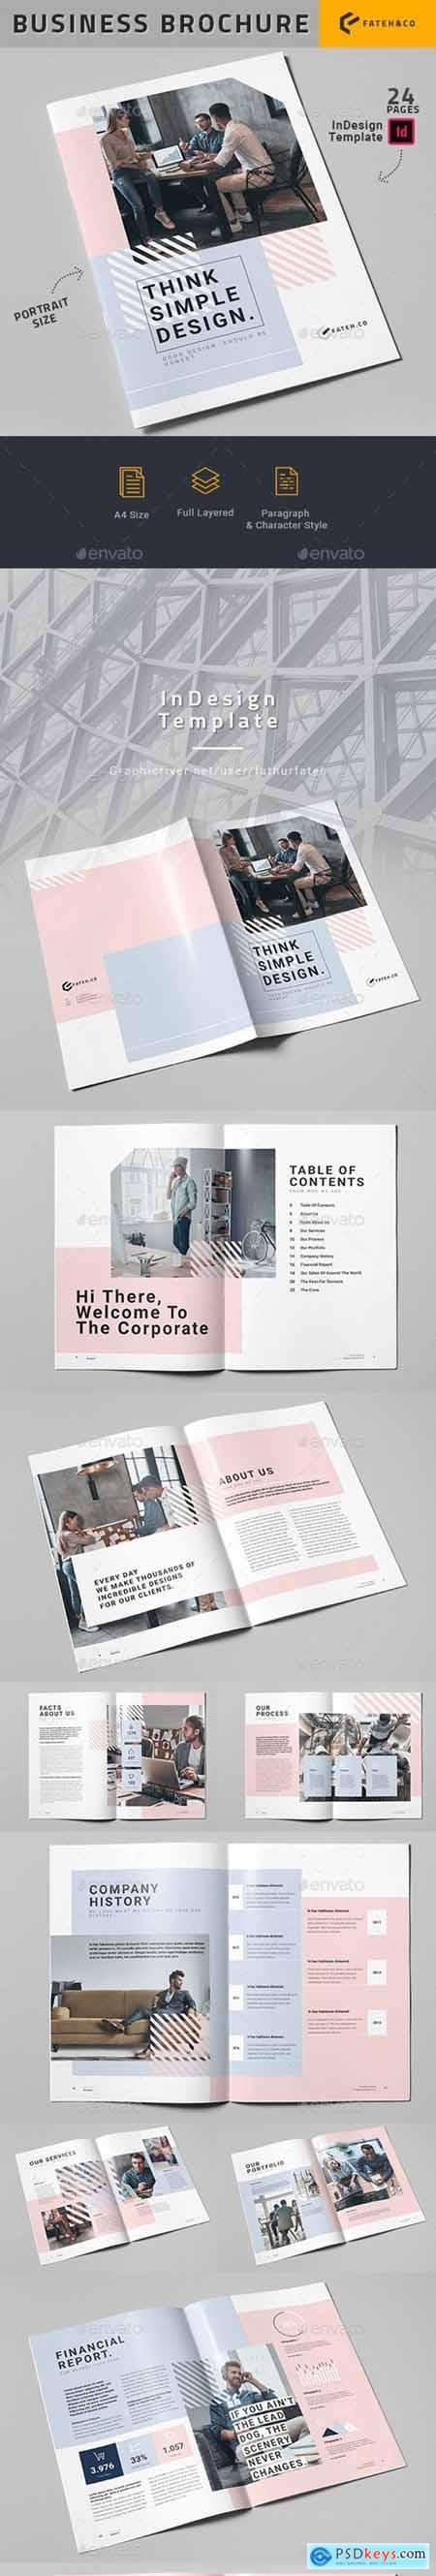 Business Brochure Vol.4 25591806